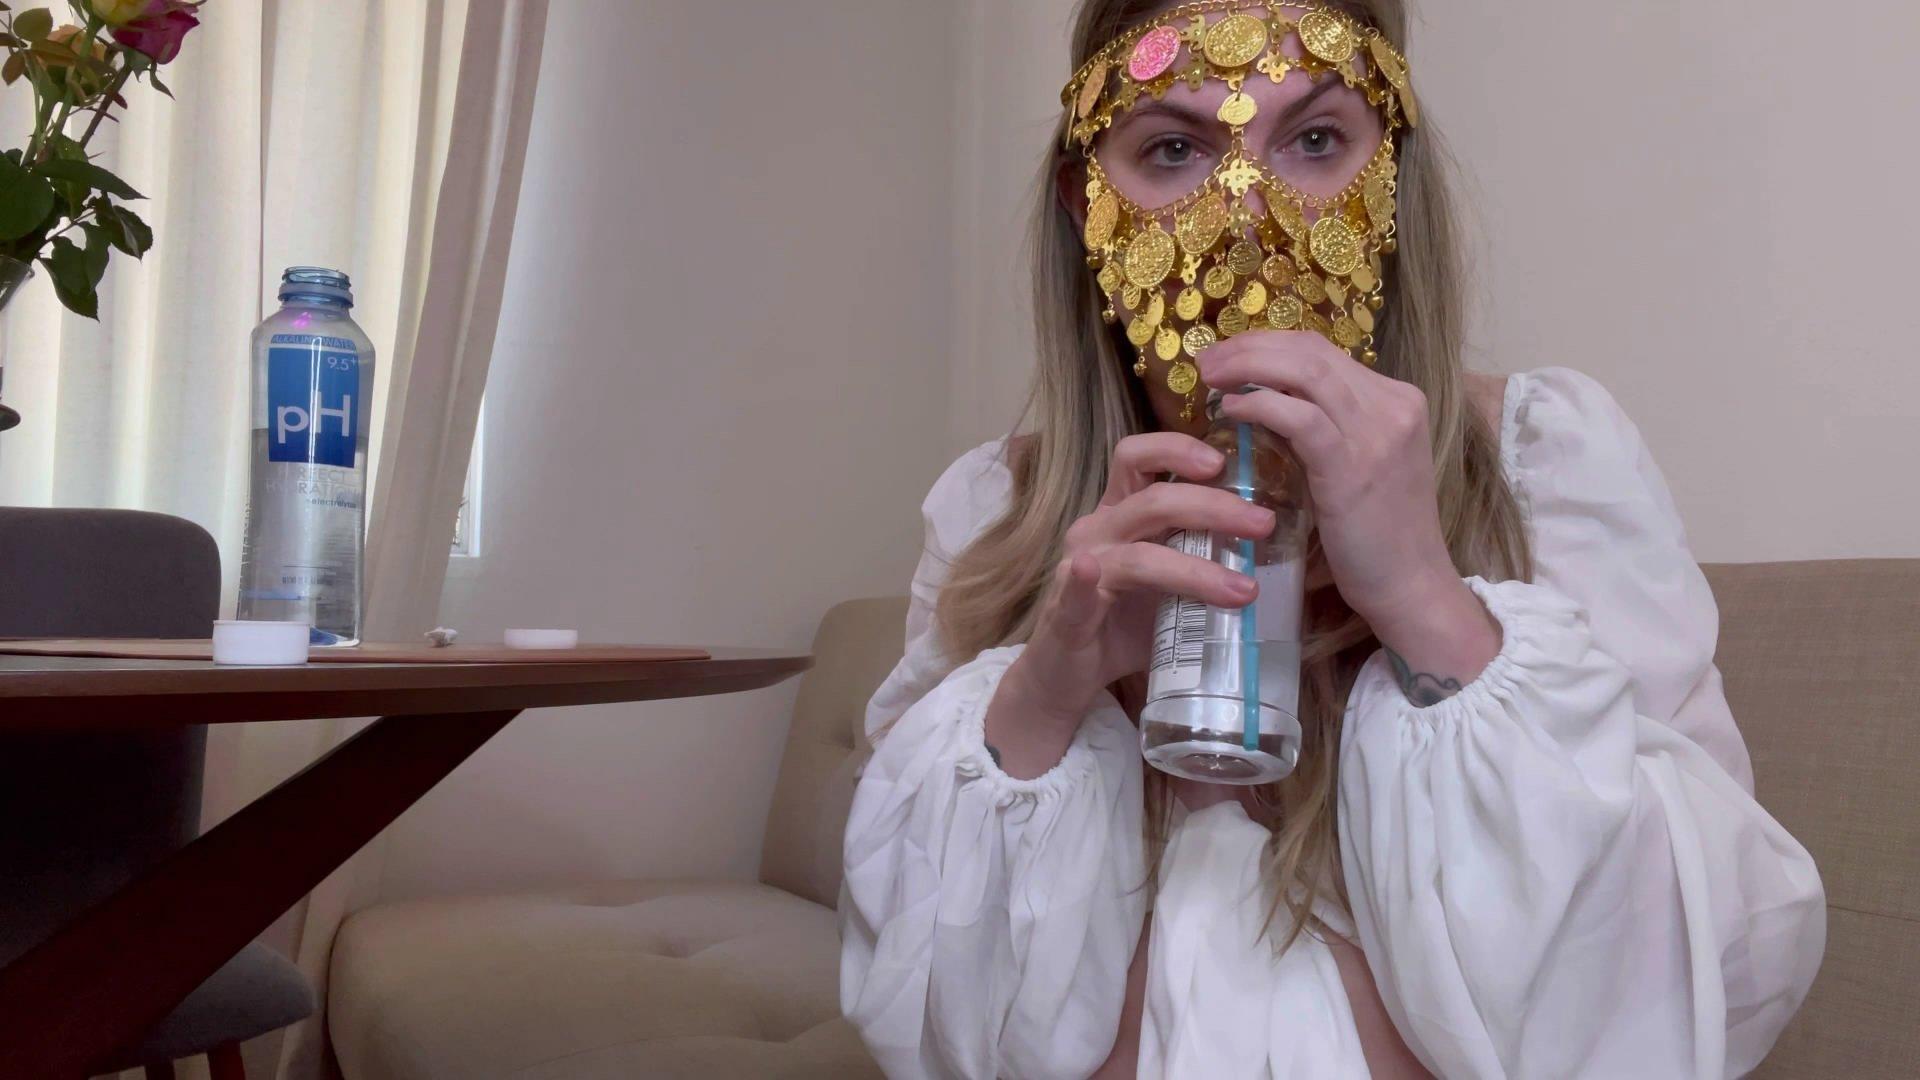 High Priestess of Pants Shitting in video Sophia_Sprinkle (Release date: Apr 25, 2021)